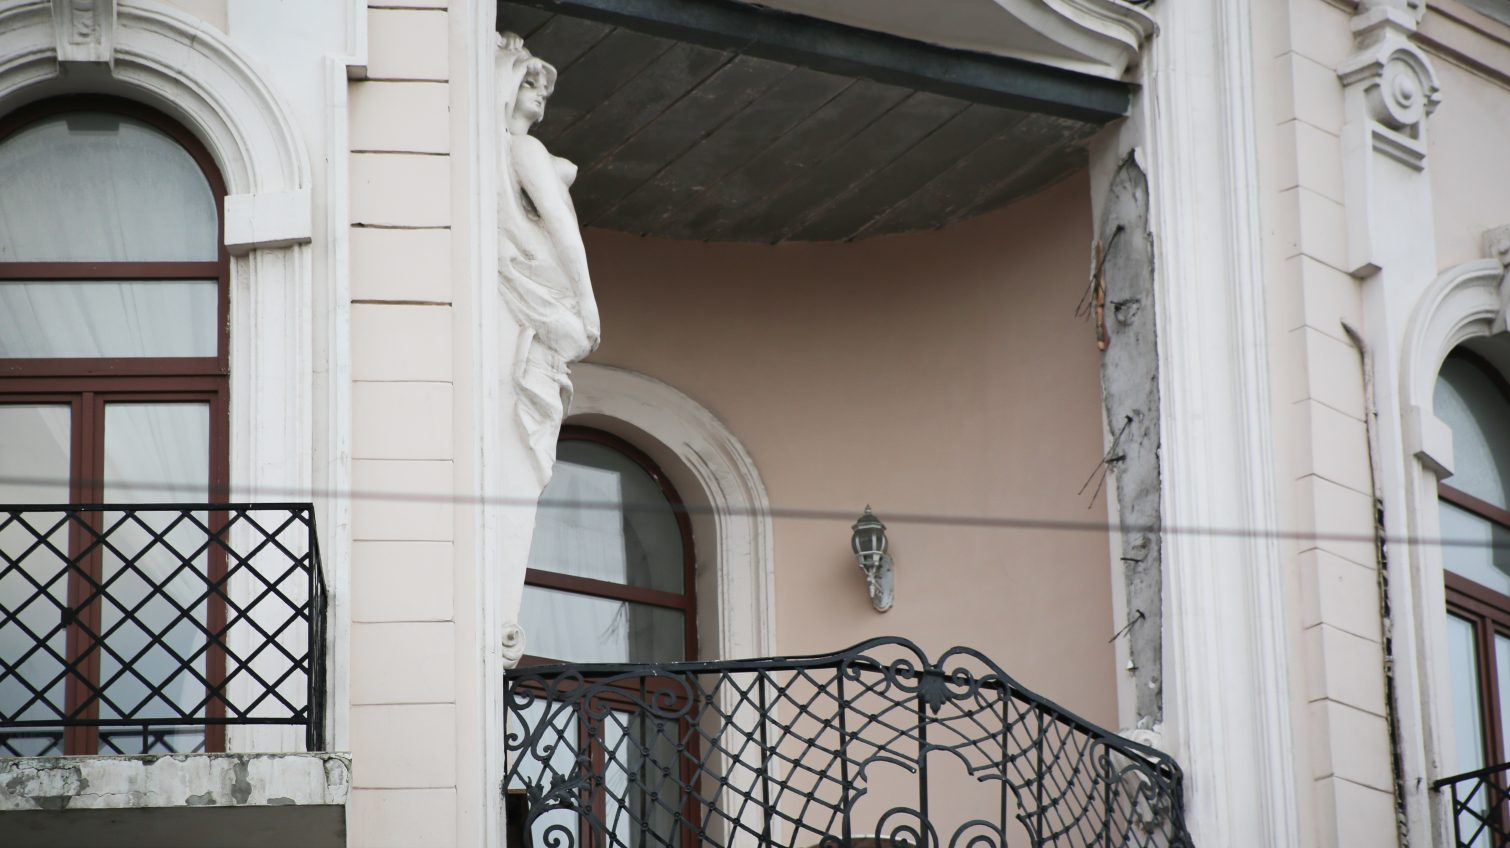 Исчезла скульптура атланта с дома в центре Одессы (фото) «фото»